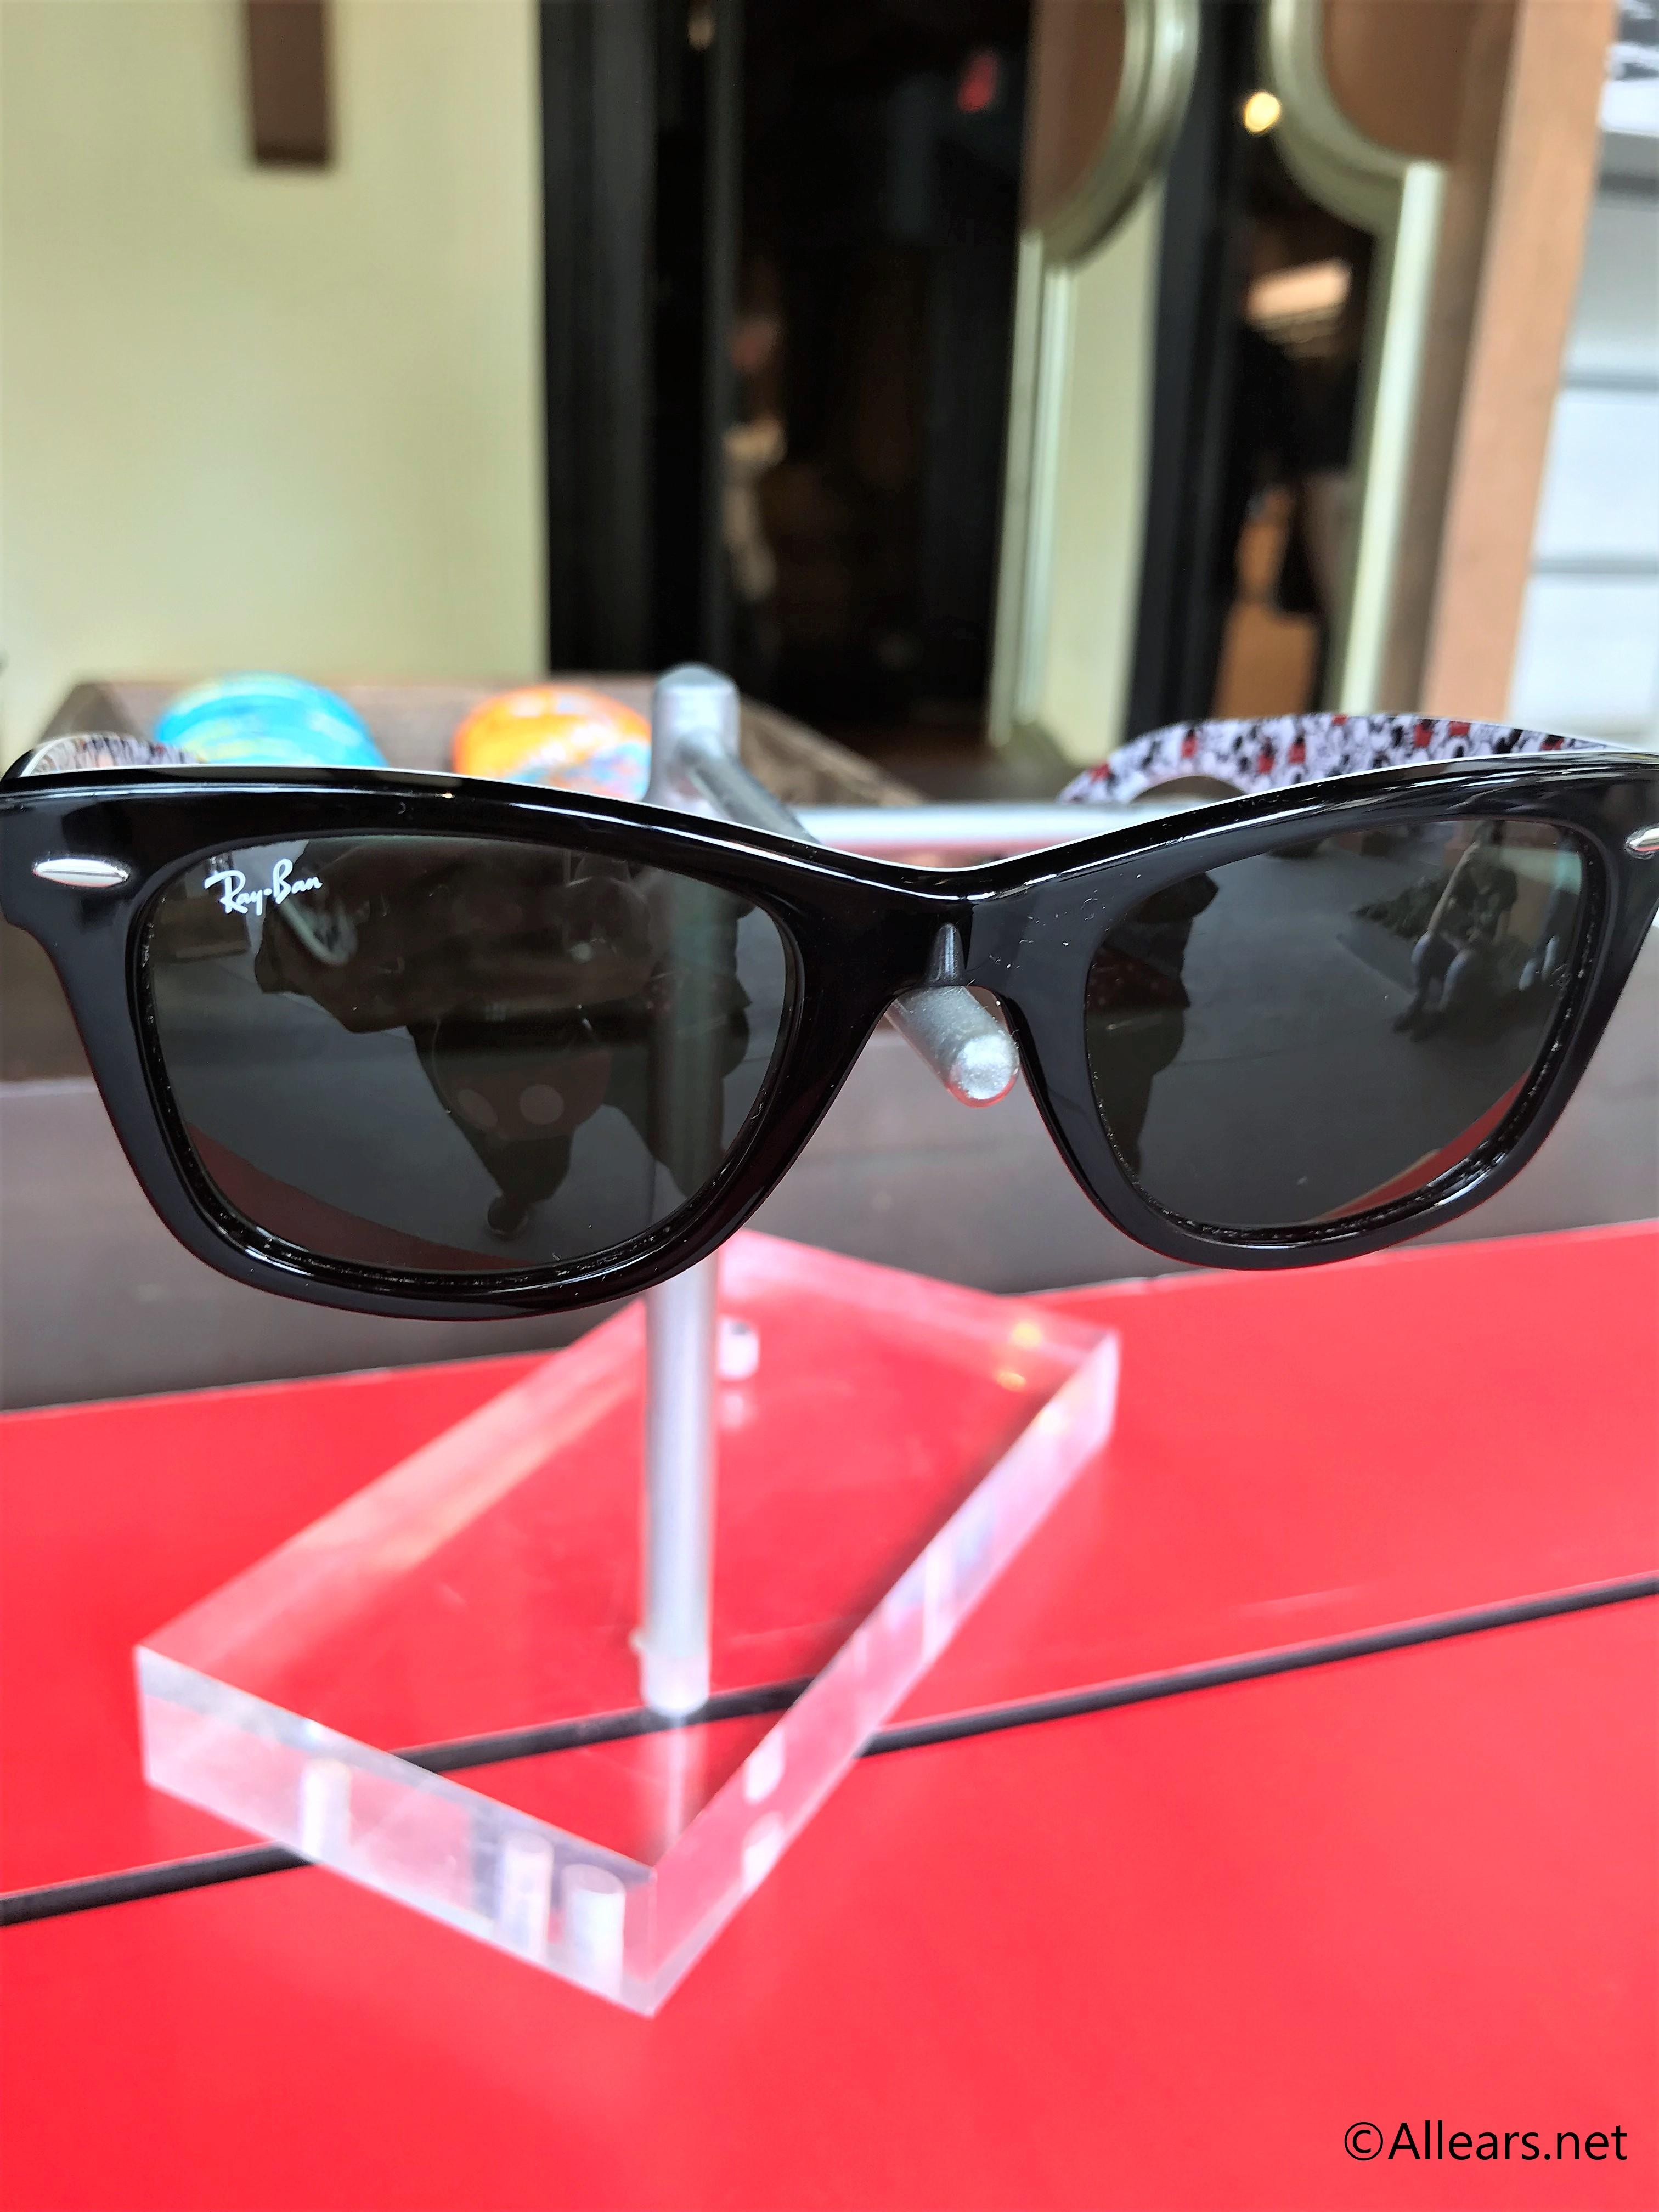 be20629a92f10 Ray-ban x Disney Wayfarer Sunglasses Spotted in Magic Kingdom ...